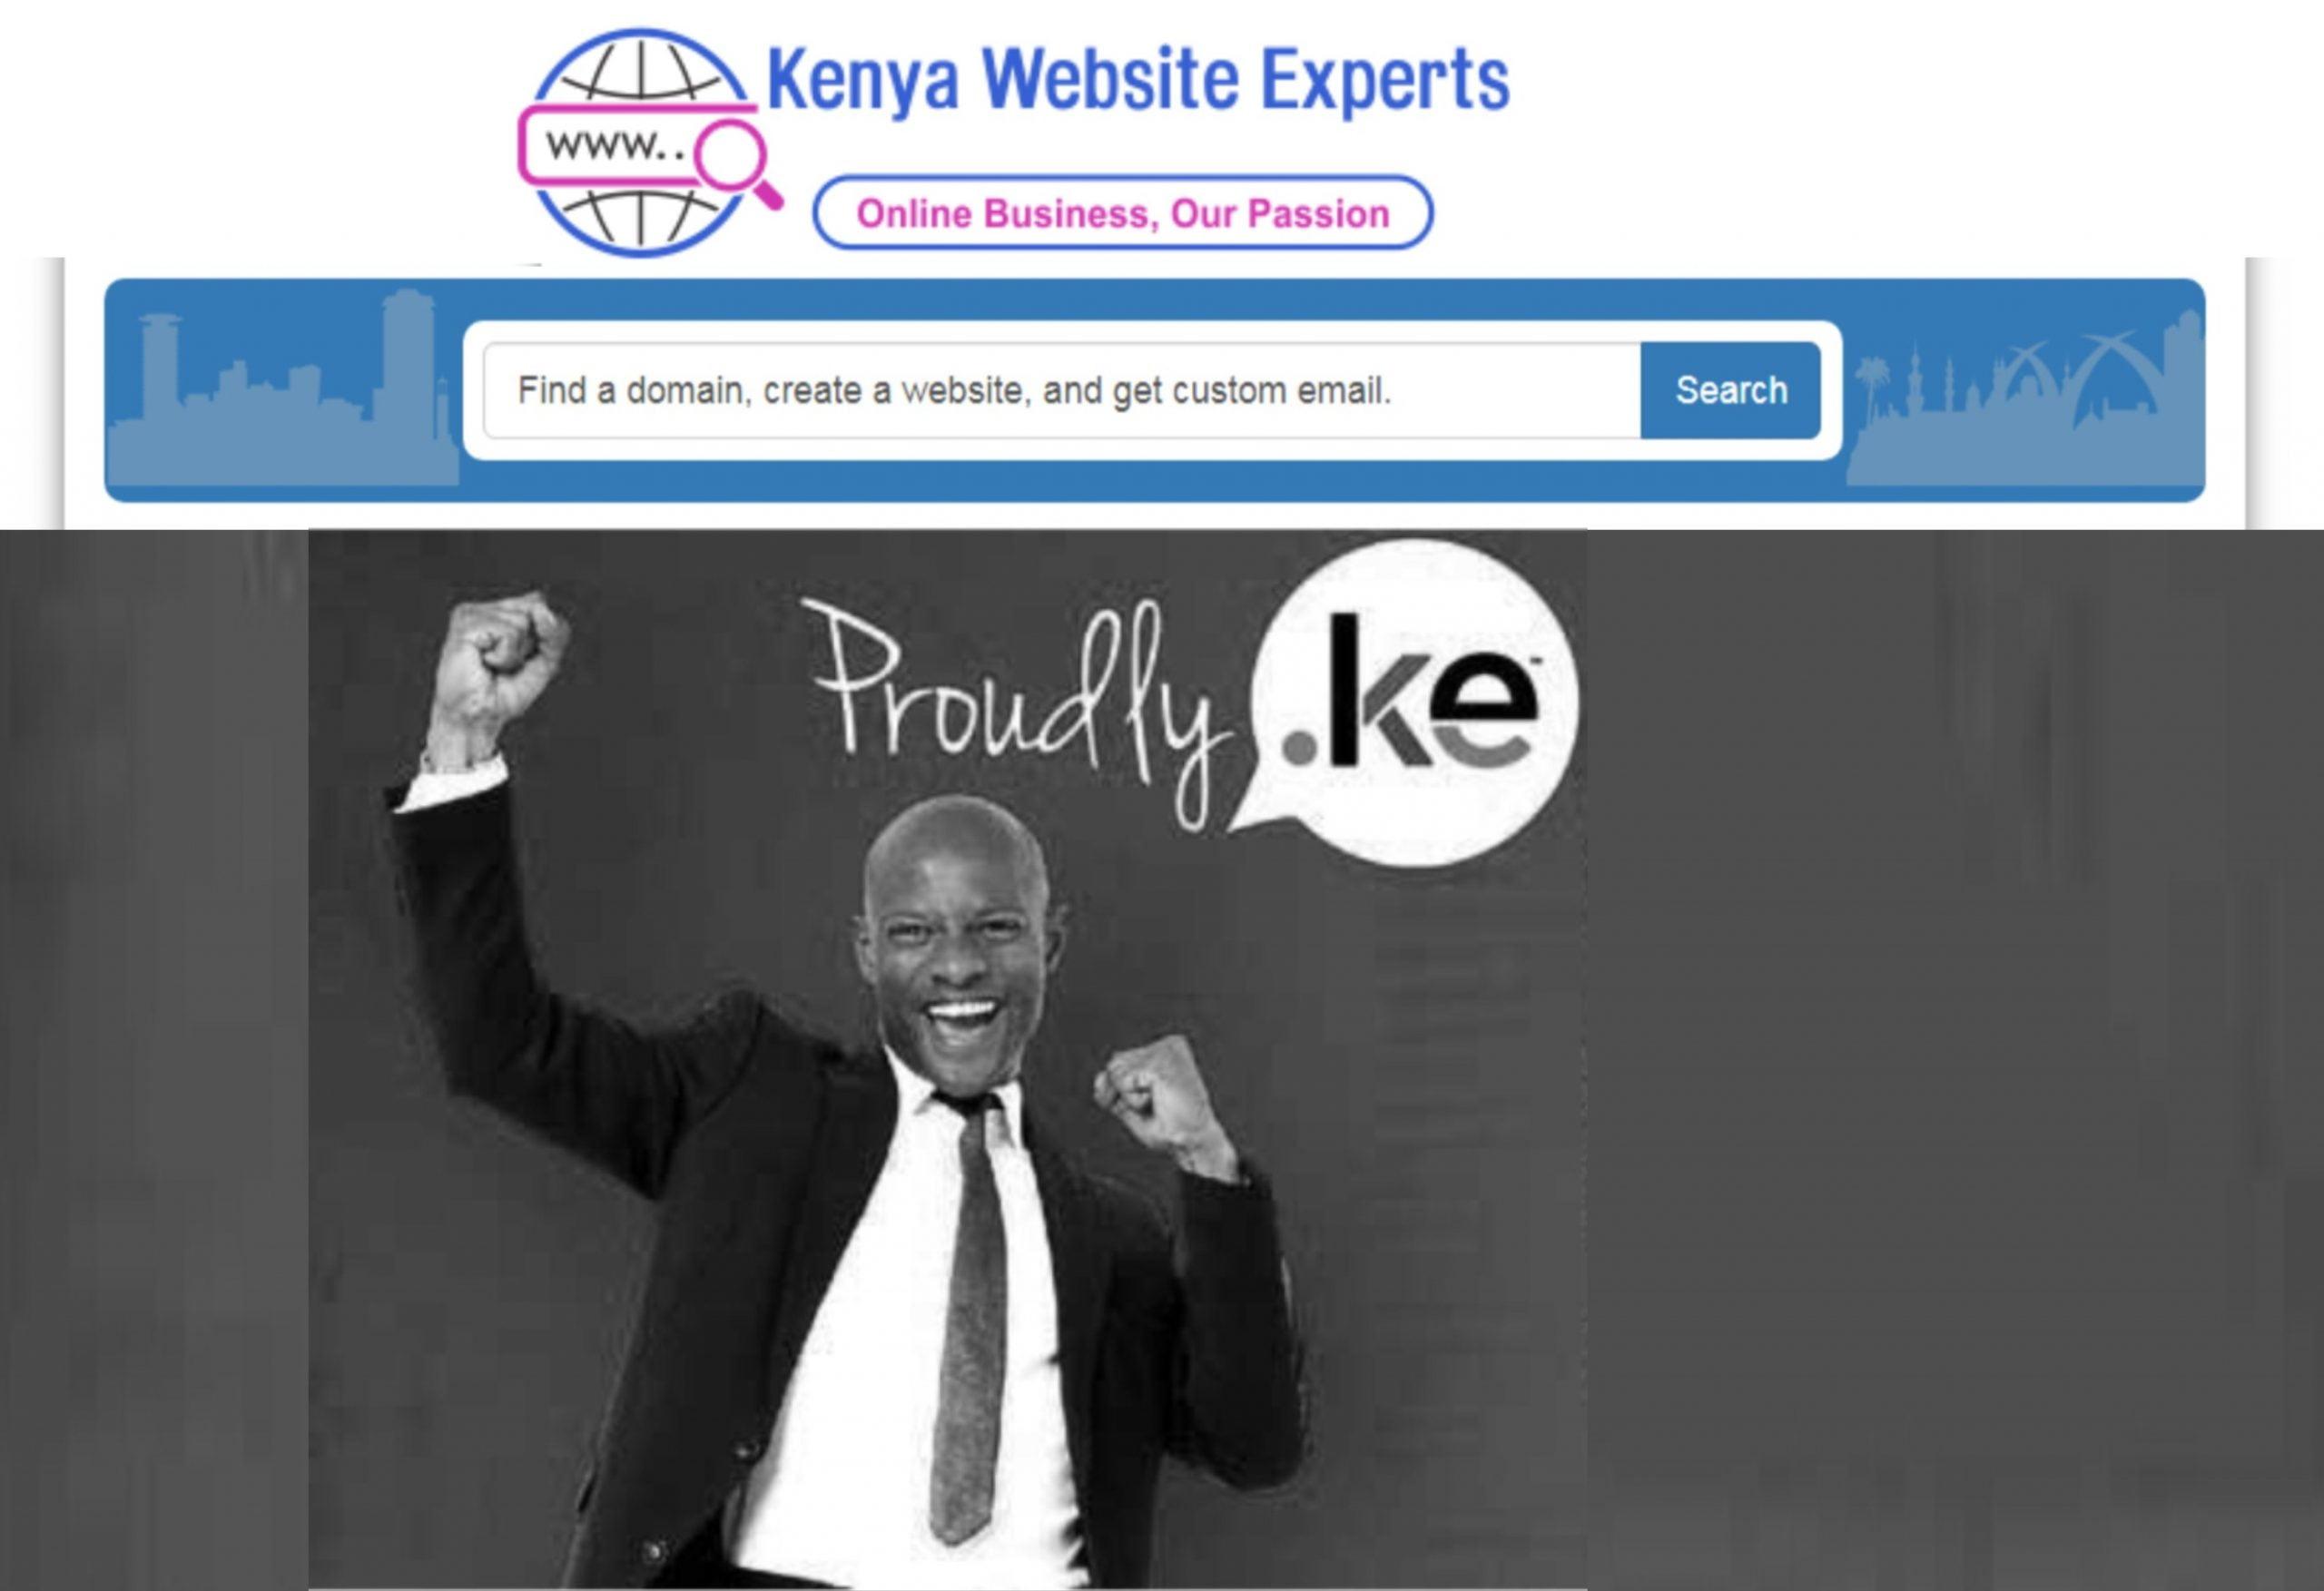 Kenya-Web-Experts